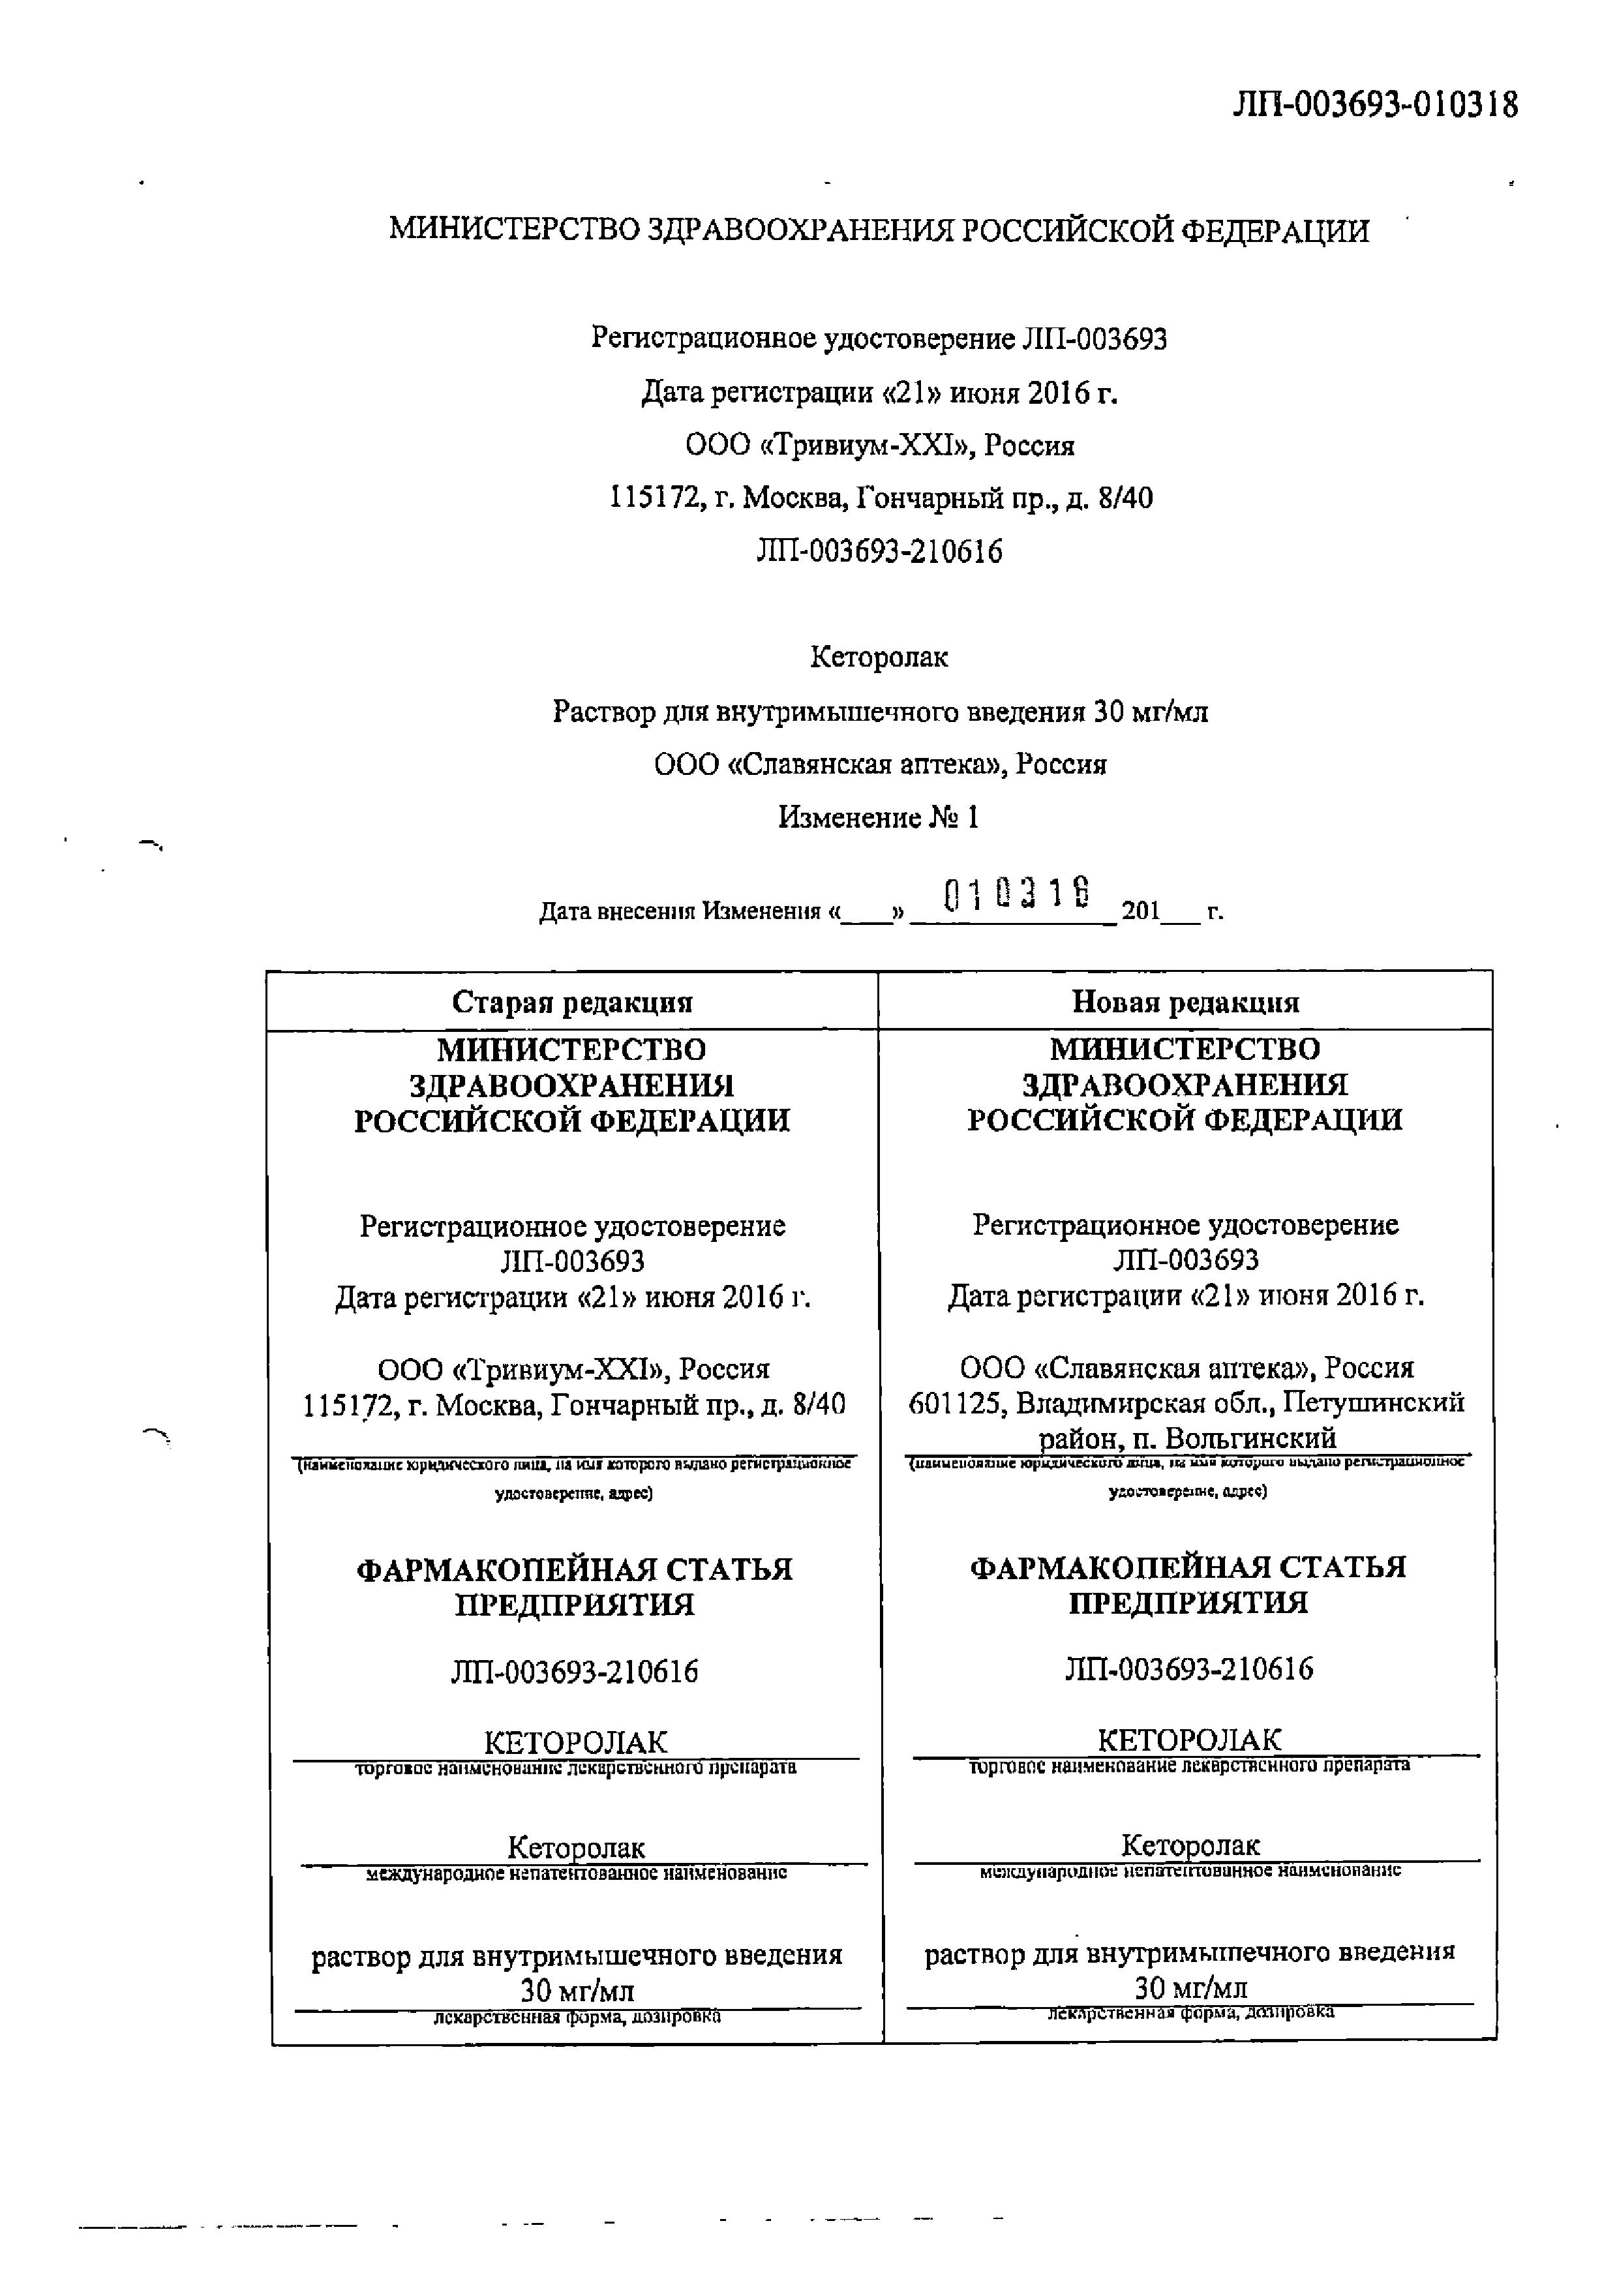 Кеторолак (для инъекций) сертификат